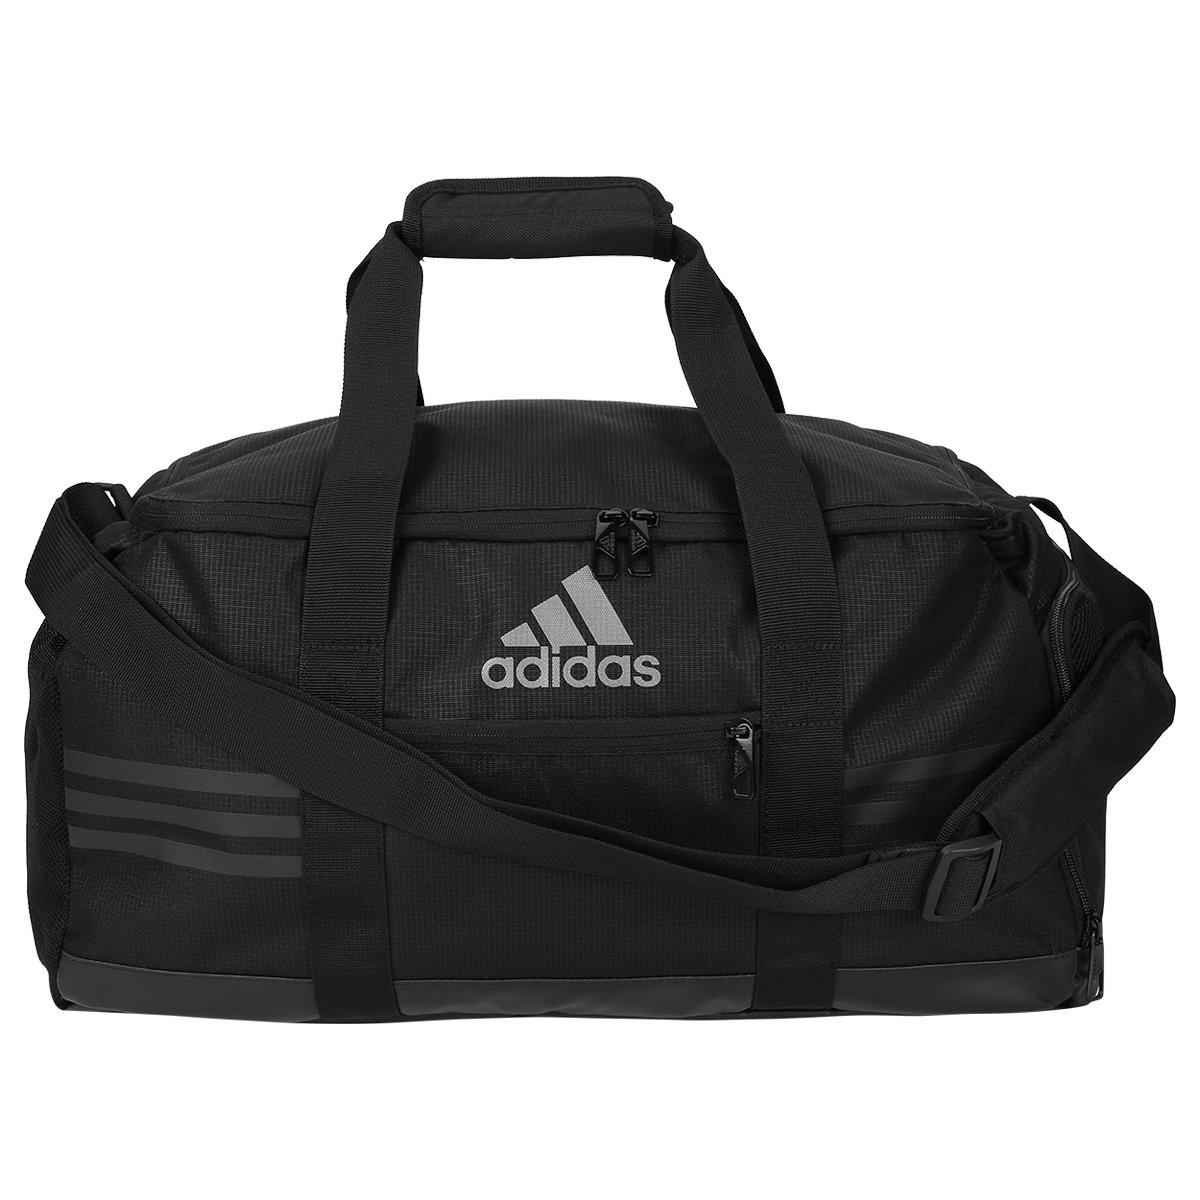 e06a8a55fffde Mala Adidas Teambag 3S Per S Uni Masculina - Compre Agora